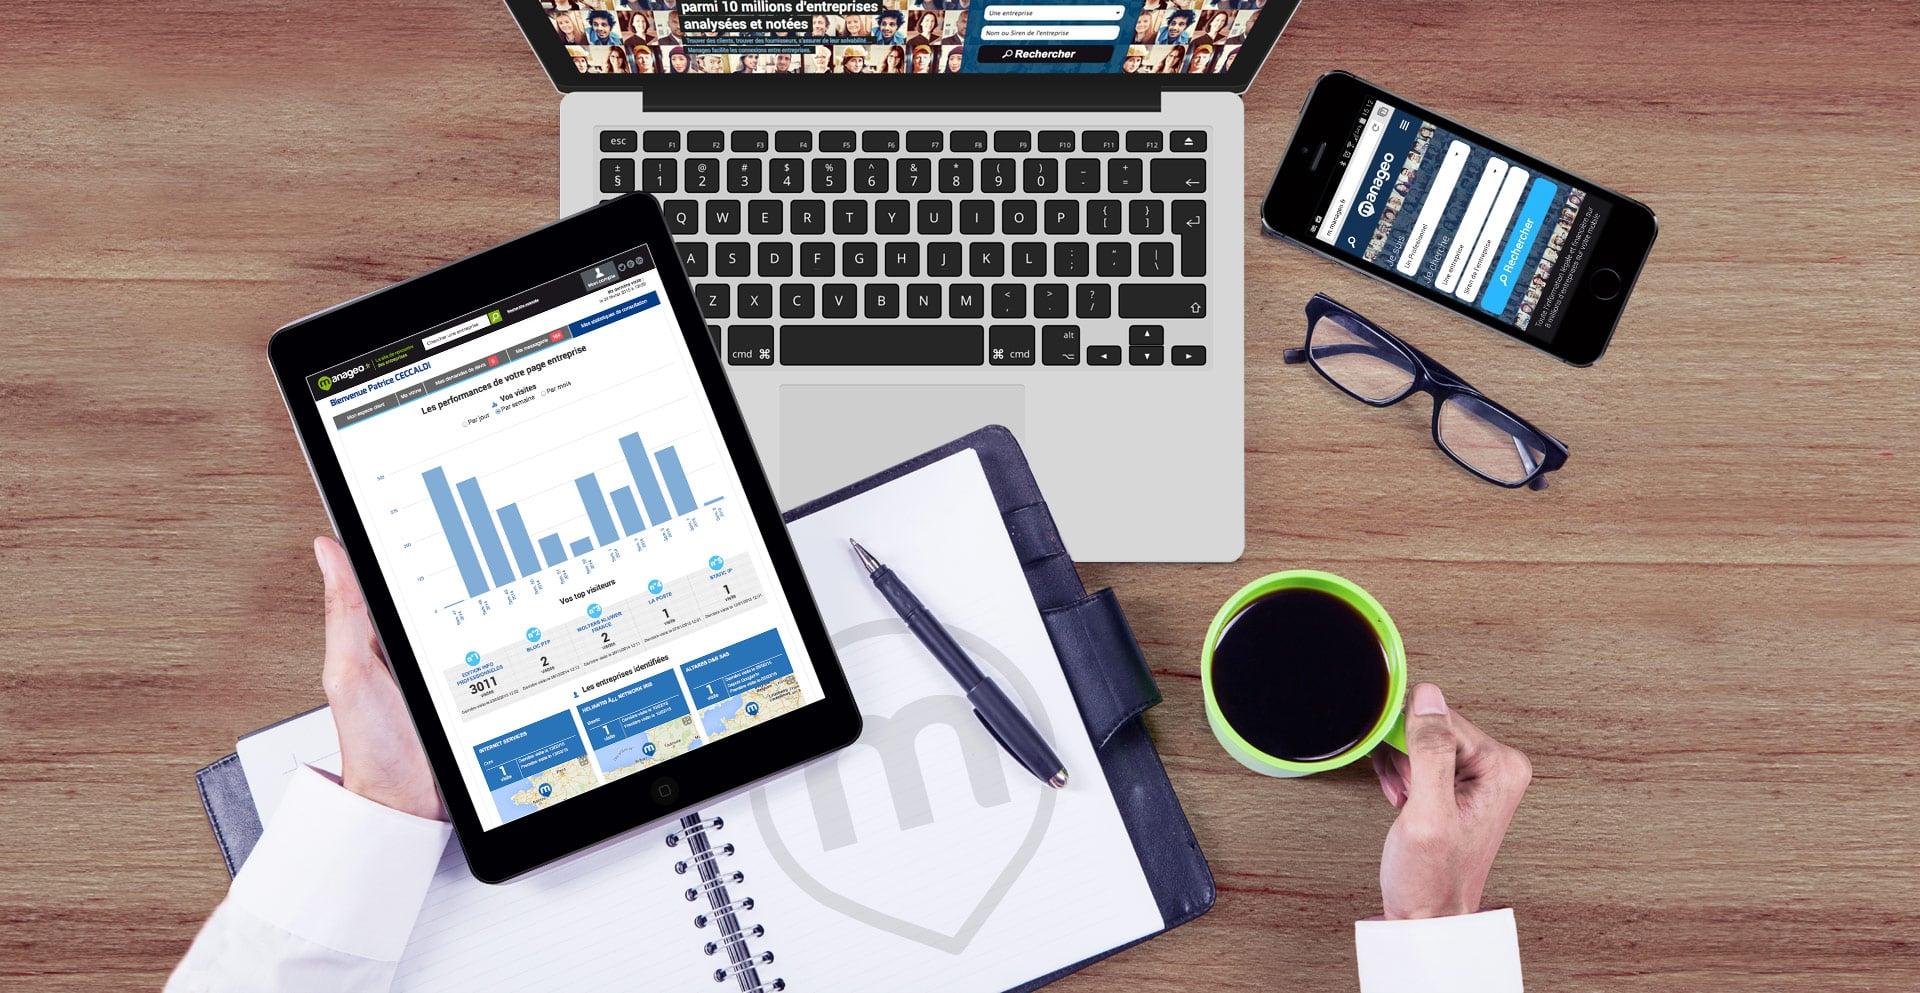 #BtoB : Manageo lance sa nouvelle plateforme de marketing digital